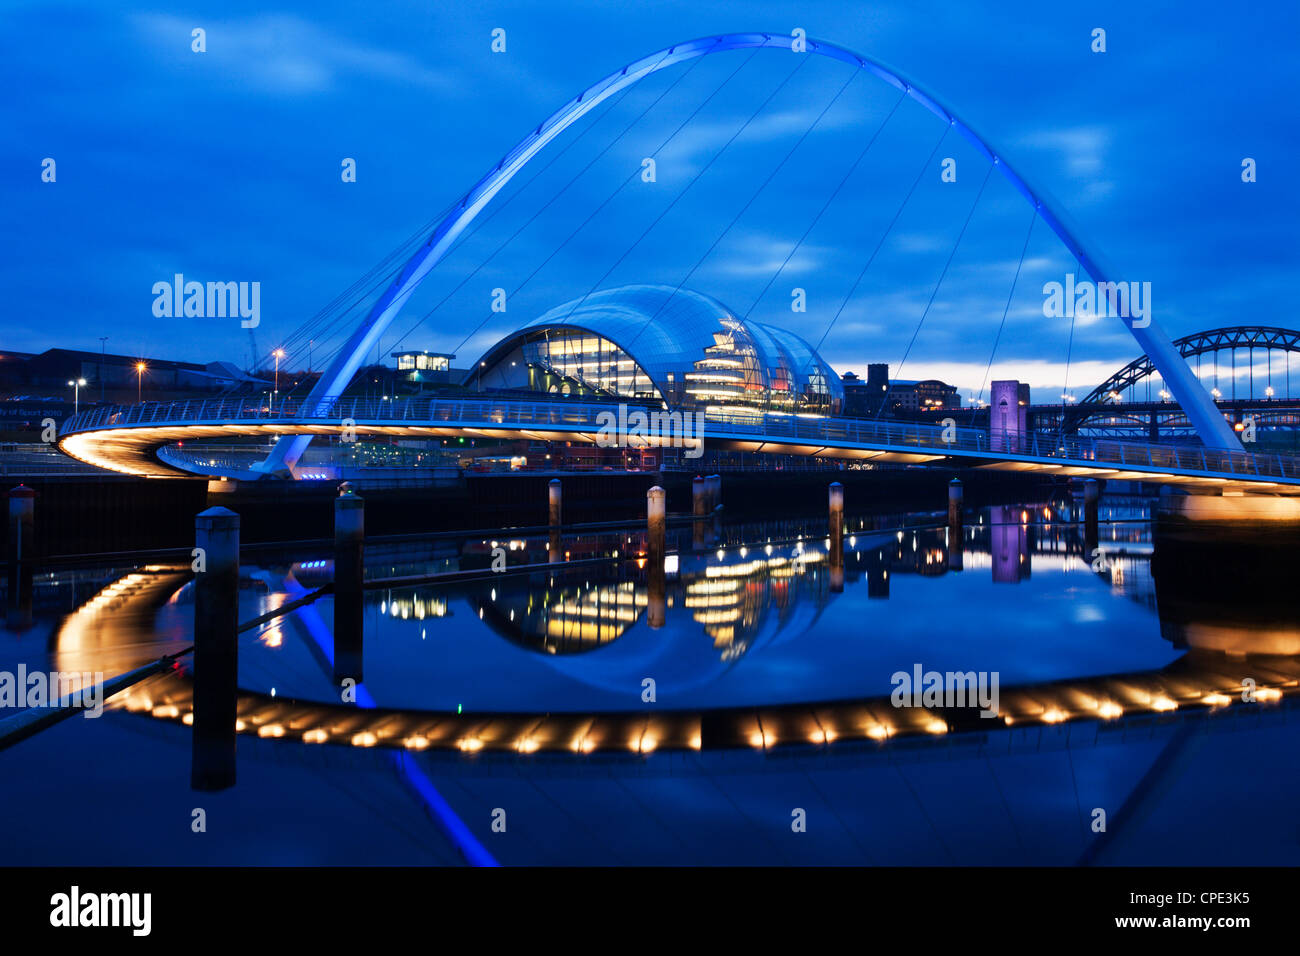 Gateshead Millennium Bridge, The Sage and the River Tyne between Newcastle and Gateshead, at dusk, Tyne and Wear, - Stock Image